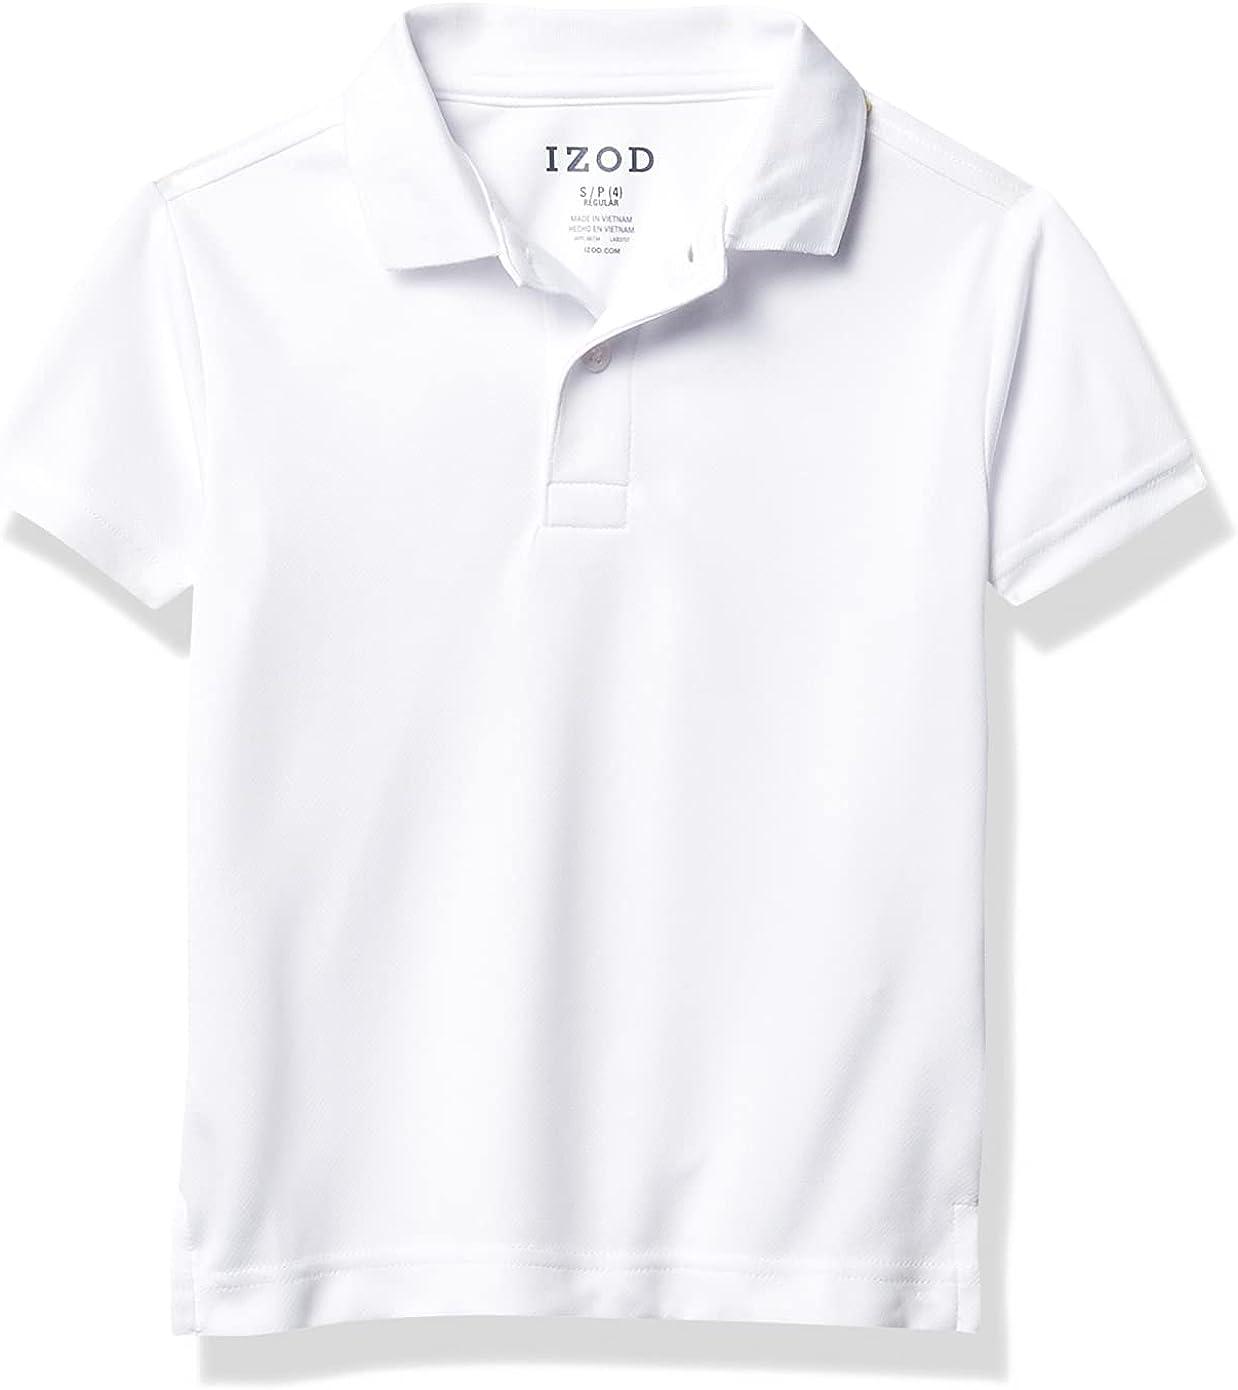 IZOD Boys' School Uniform Performance Short Sleeve Solid Polo